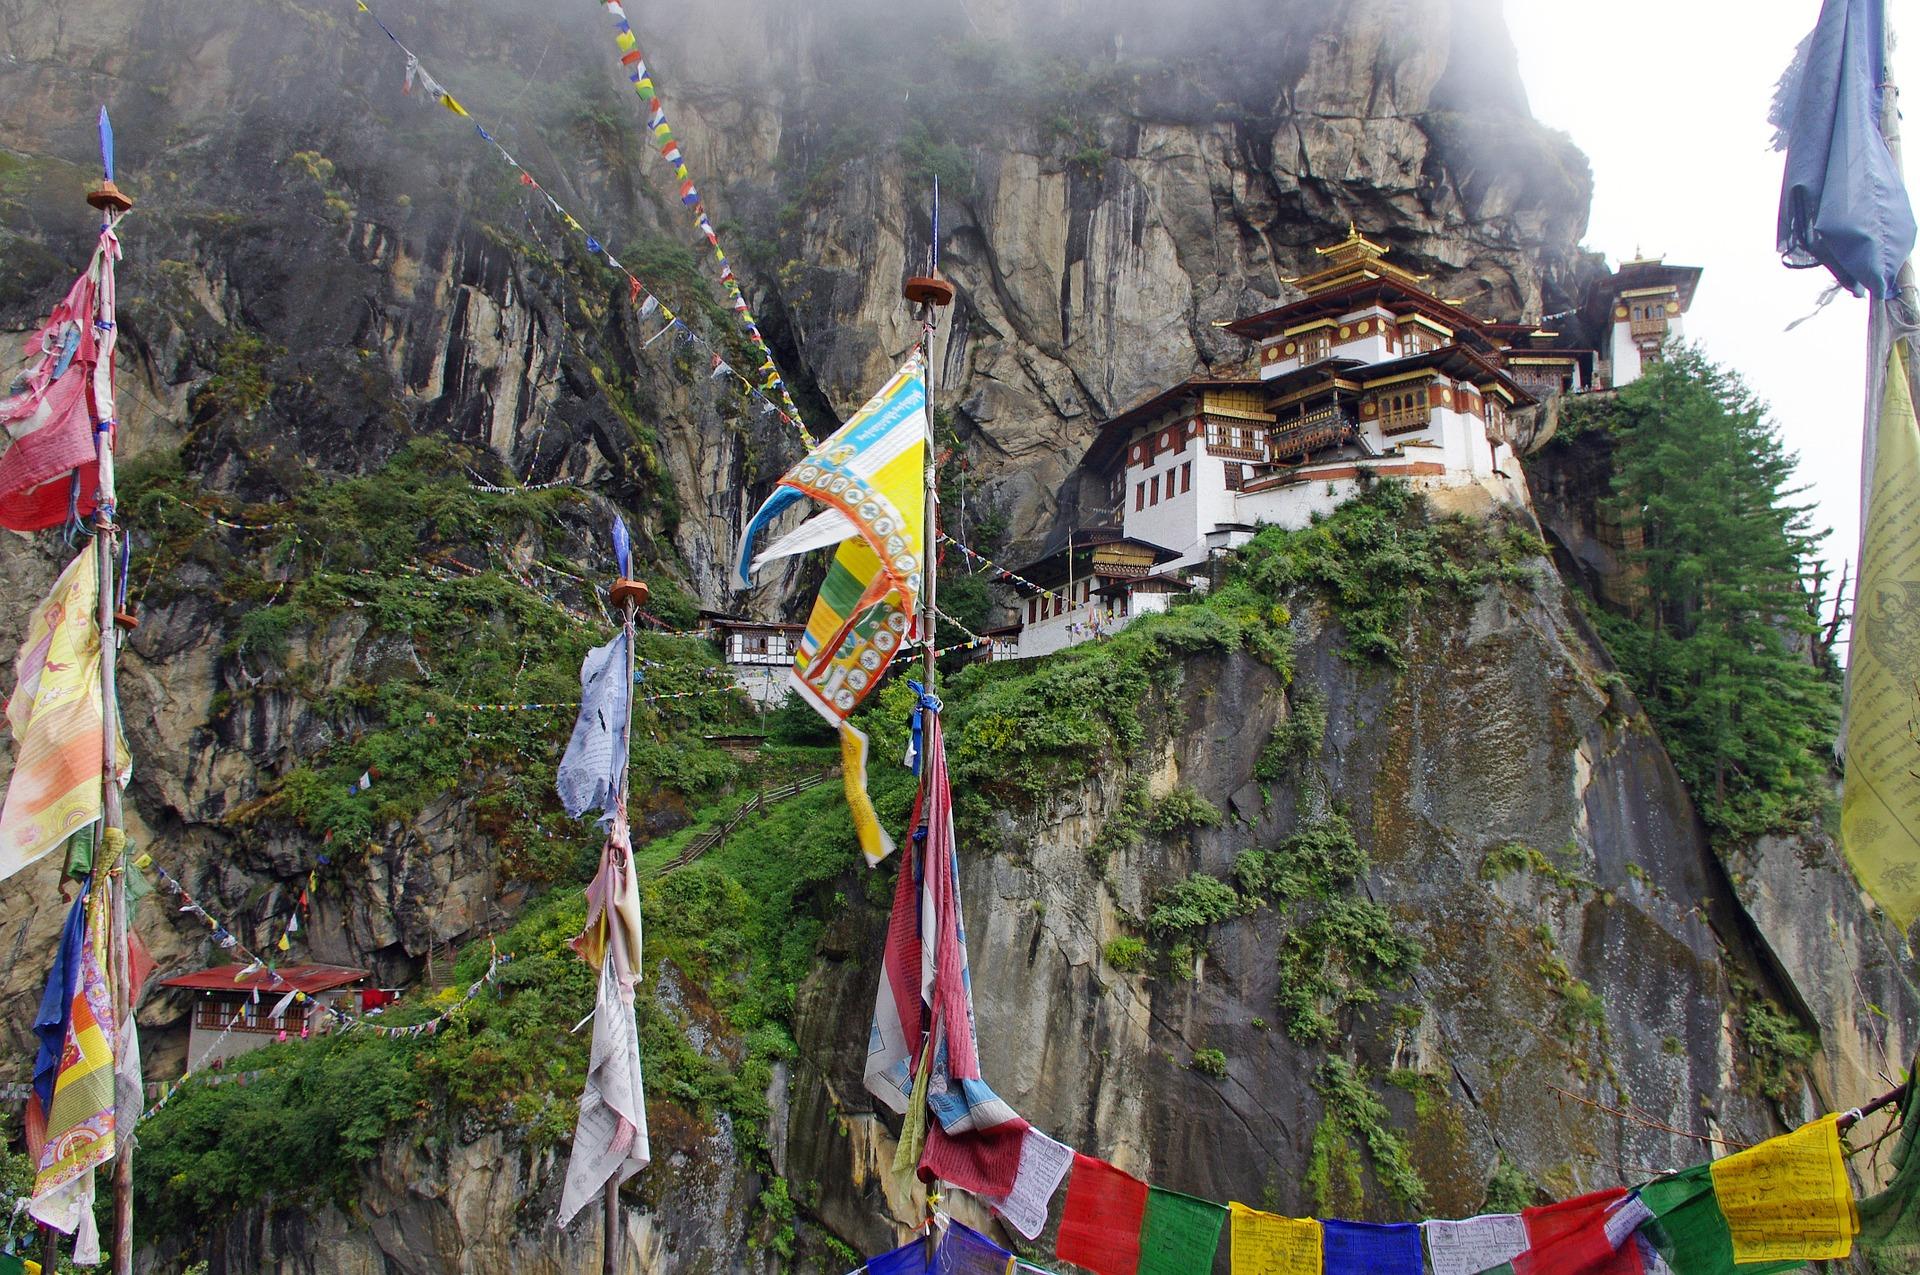 Taktshang monastère du Bhoutan